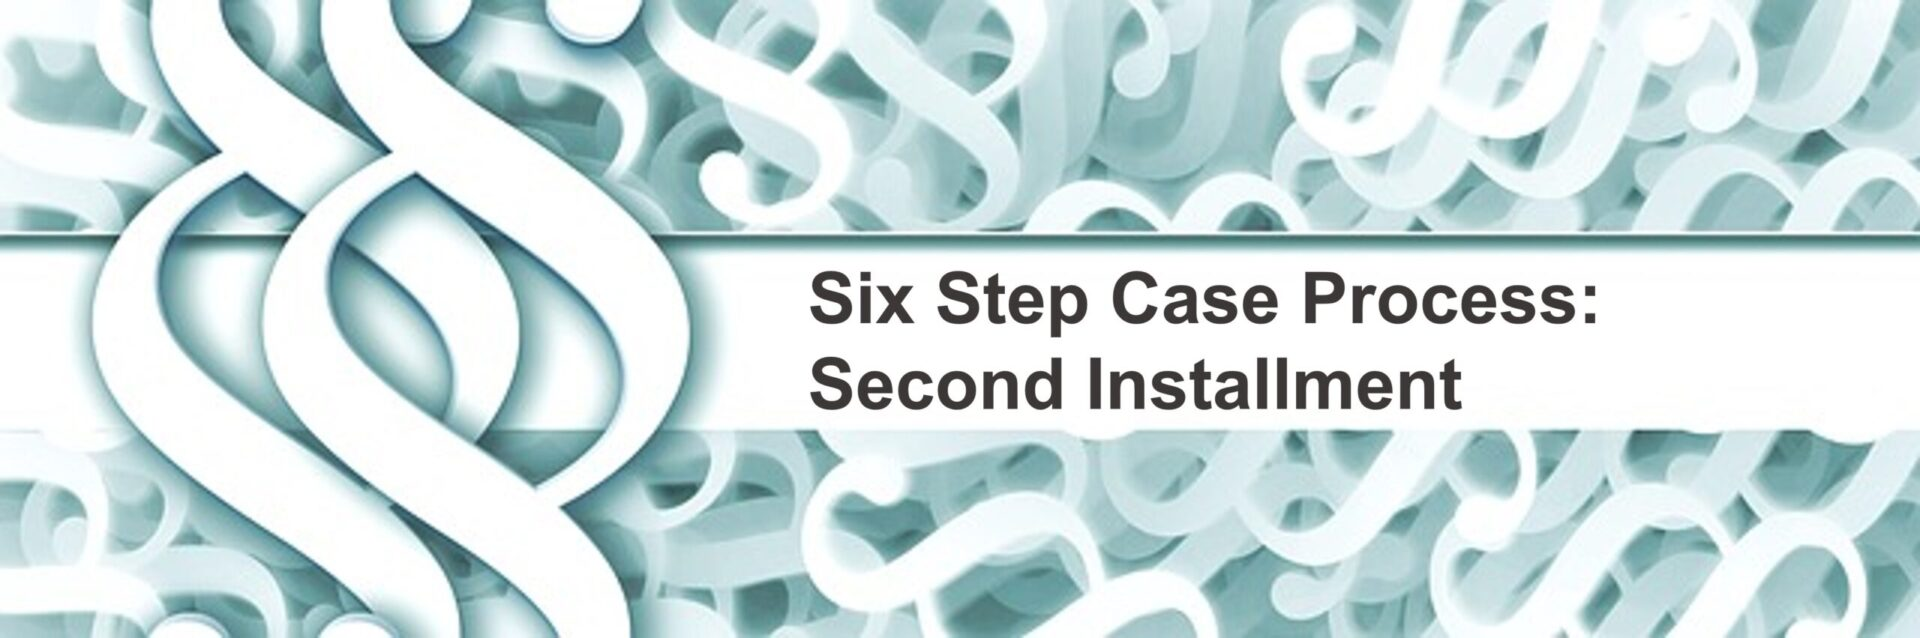 HFLG Six Step Process-2nd Installment